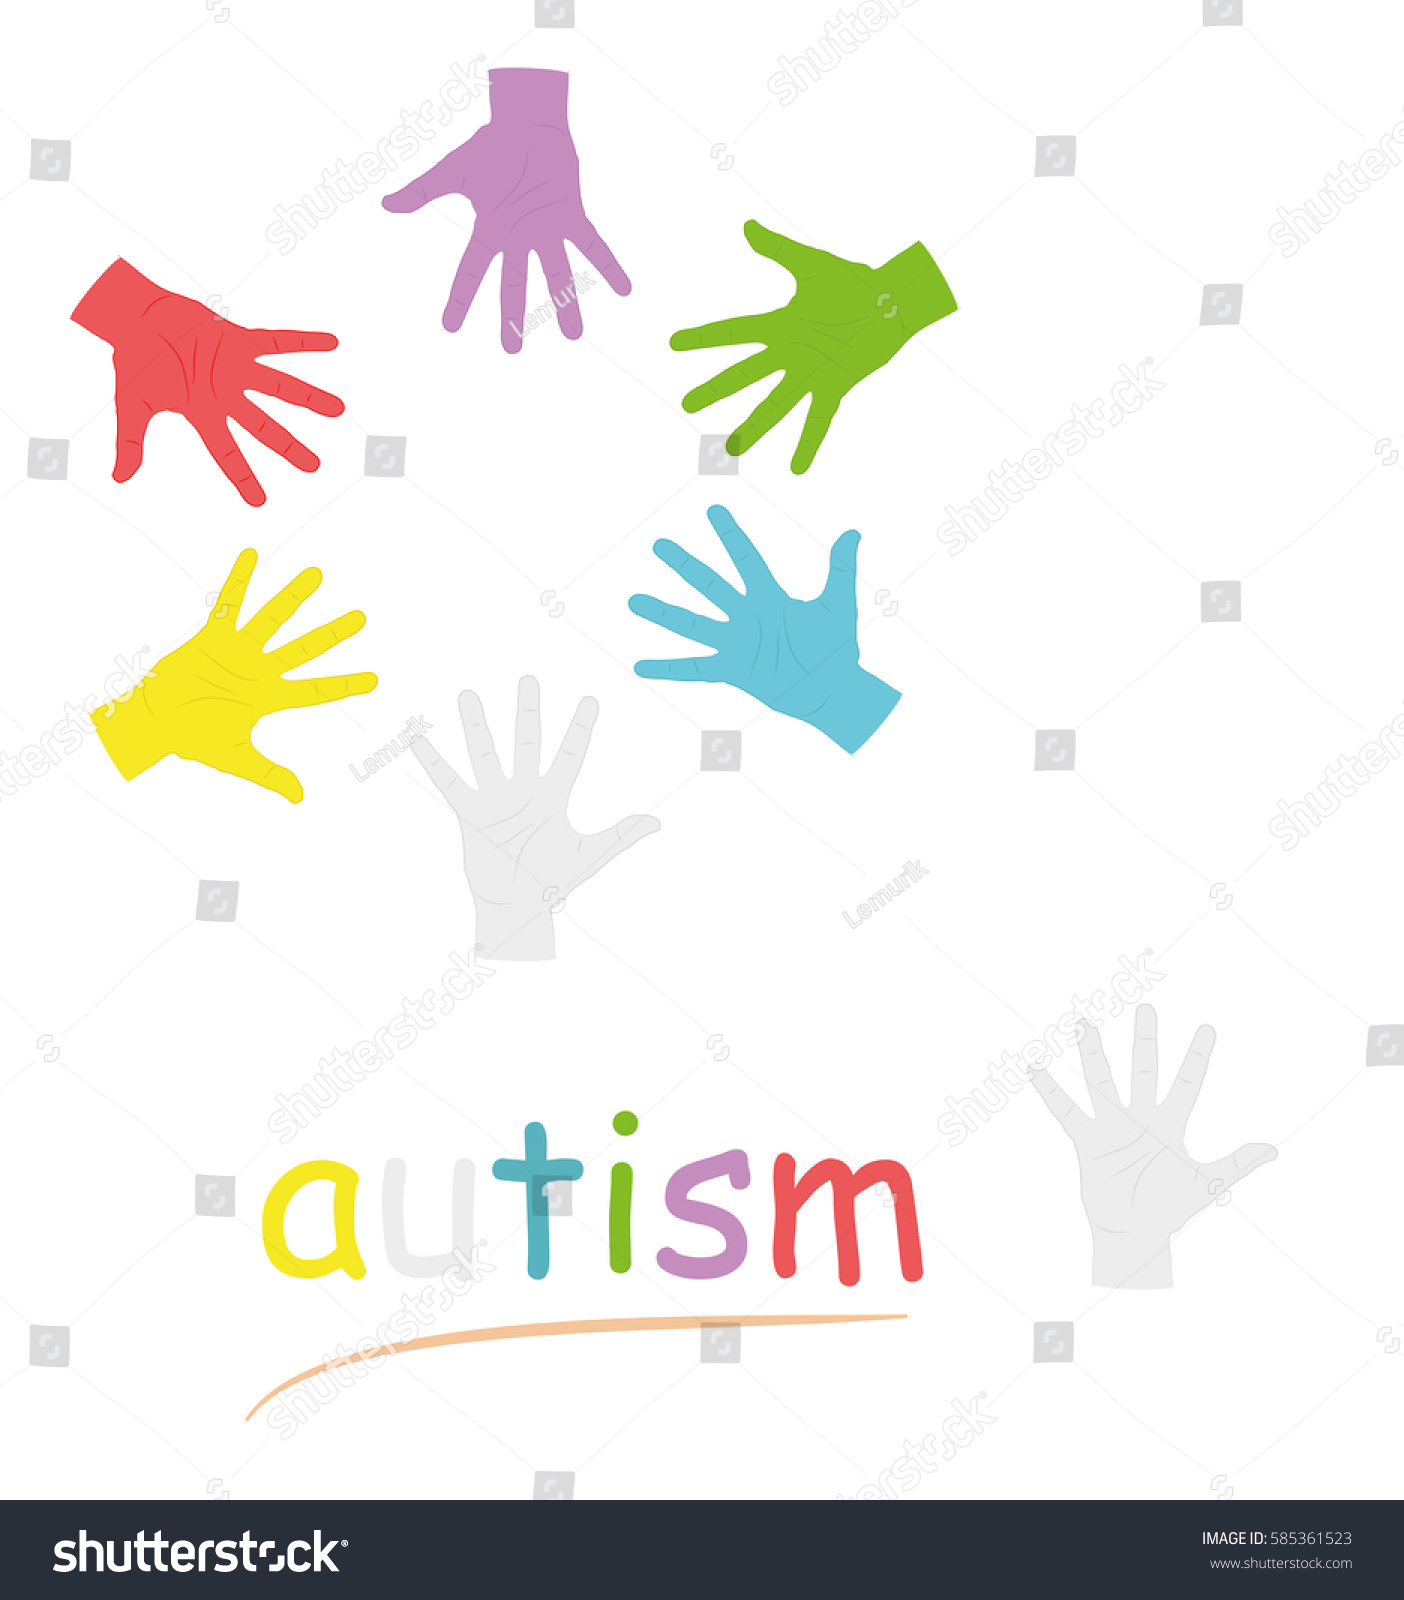 Hands different colors circle symbol autism stock vector 585361523 hands of different colors in a circle symbol of autism vector illustration biocorpaavc